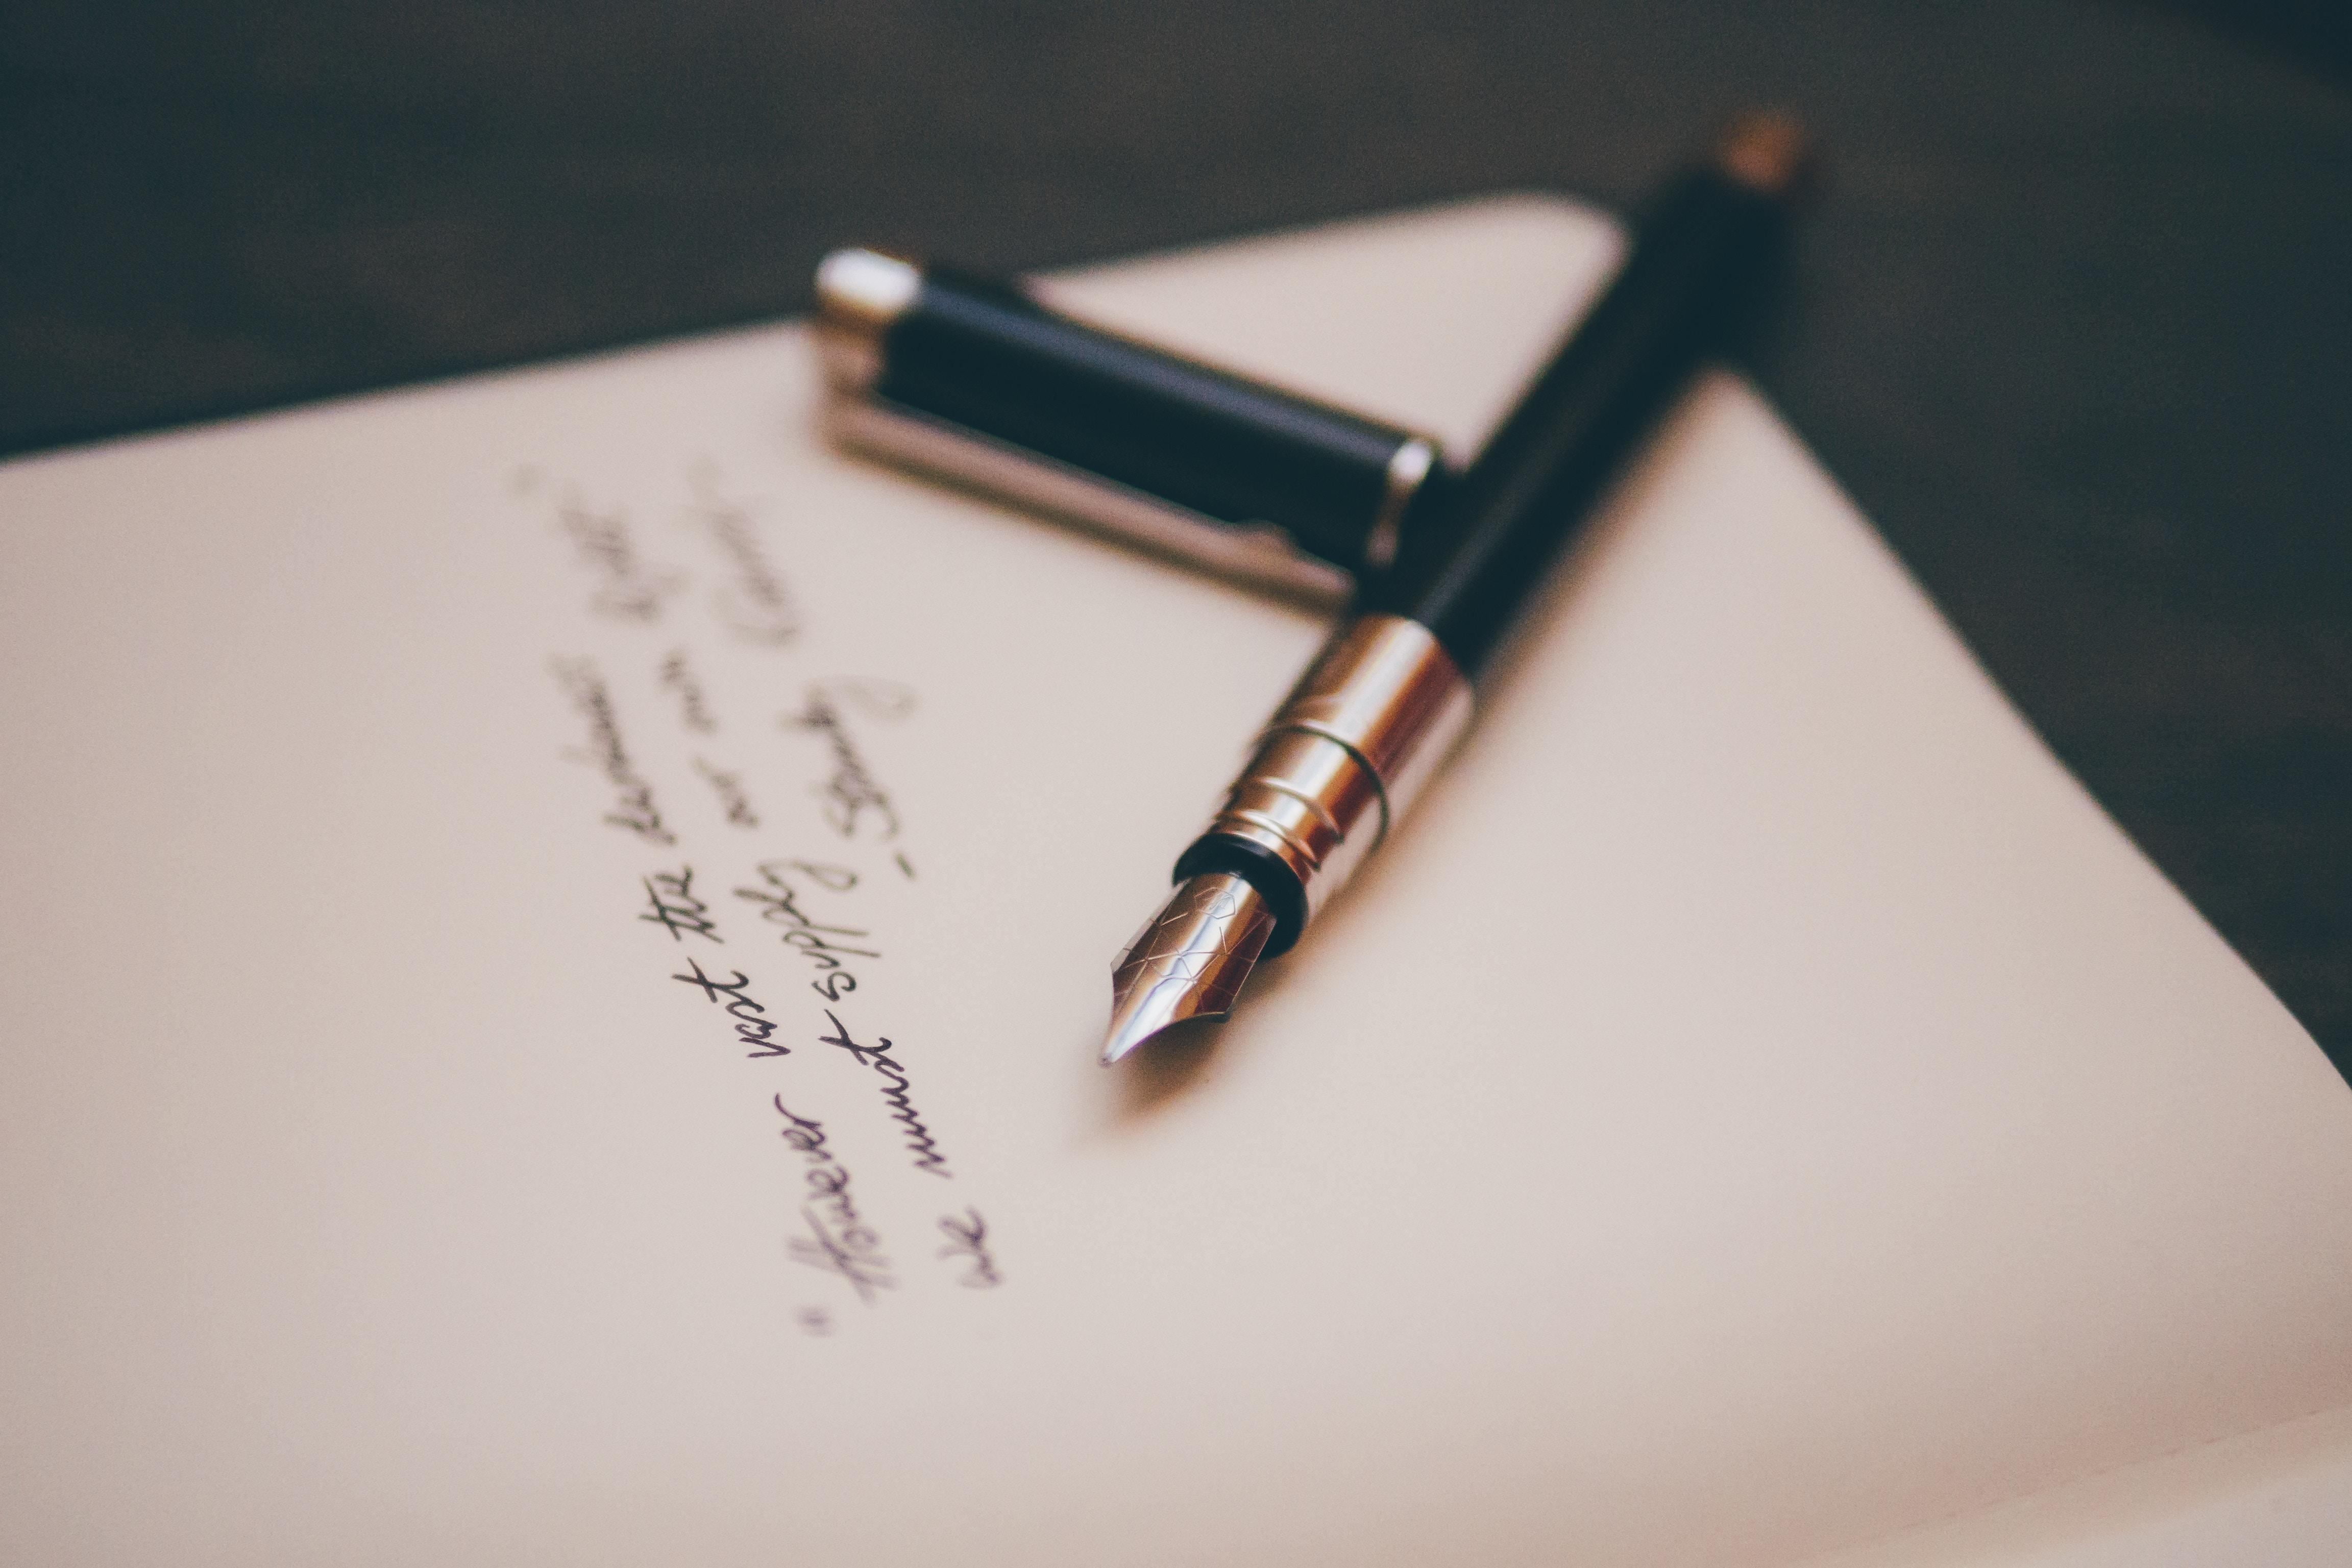 A black fountain pen sits atop a half-written letter.